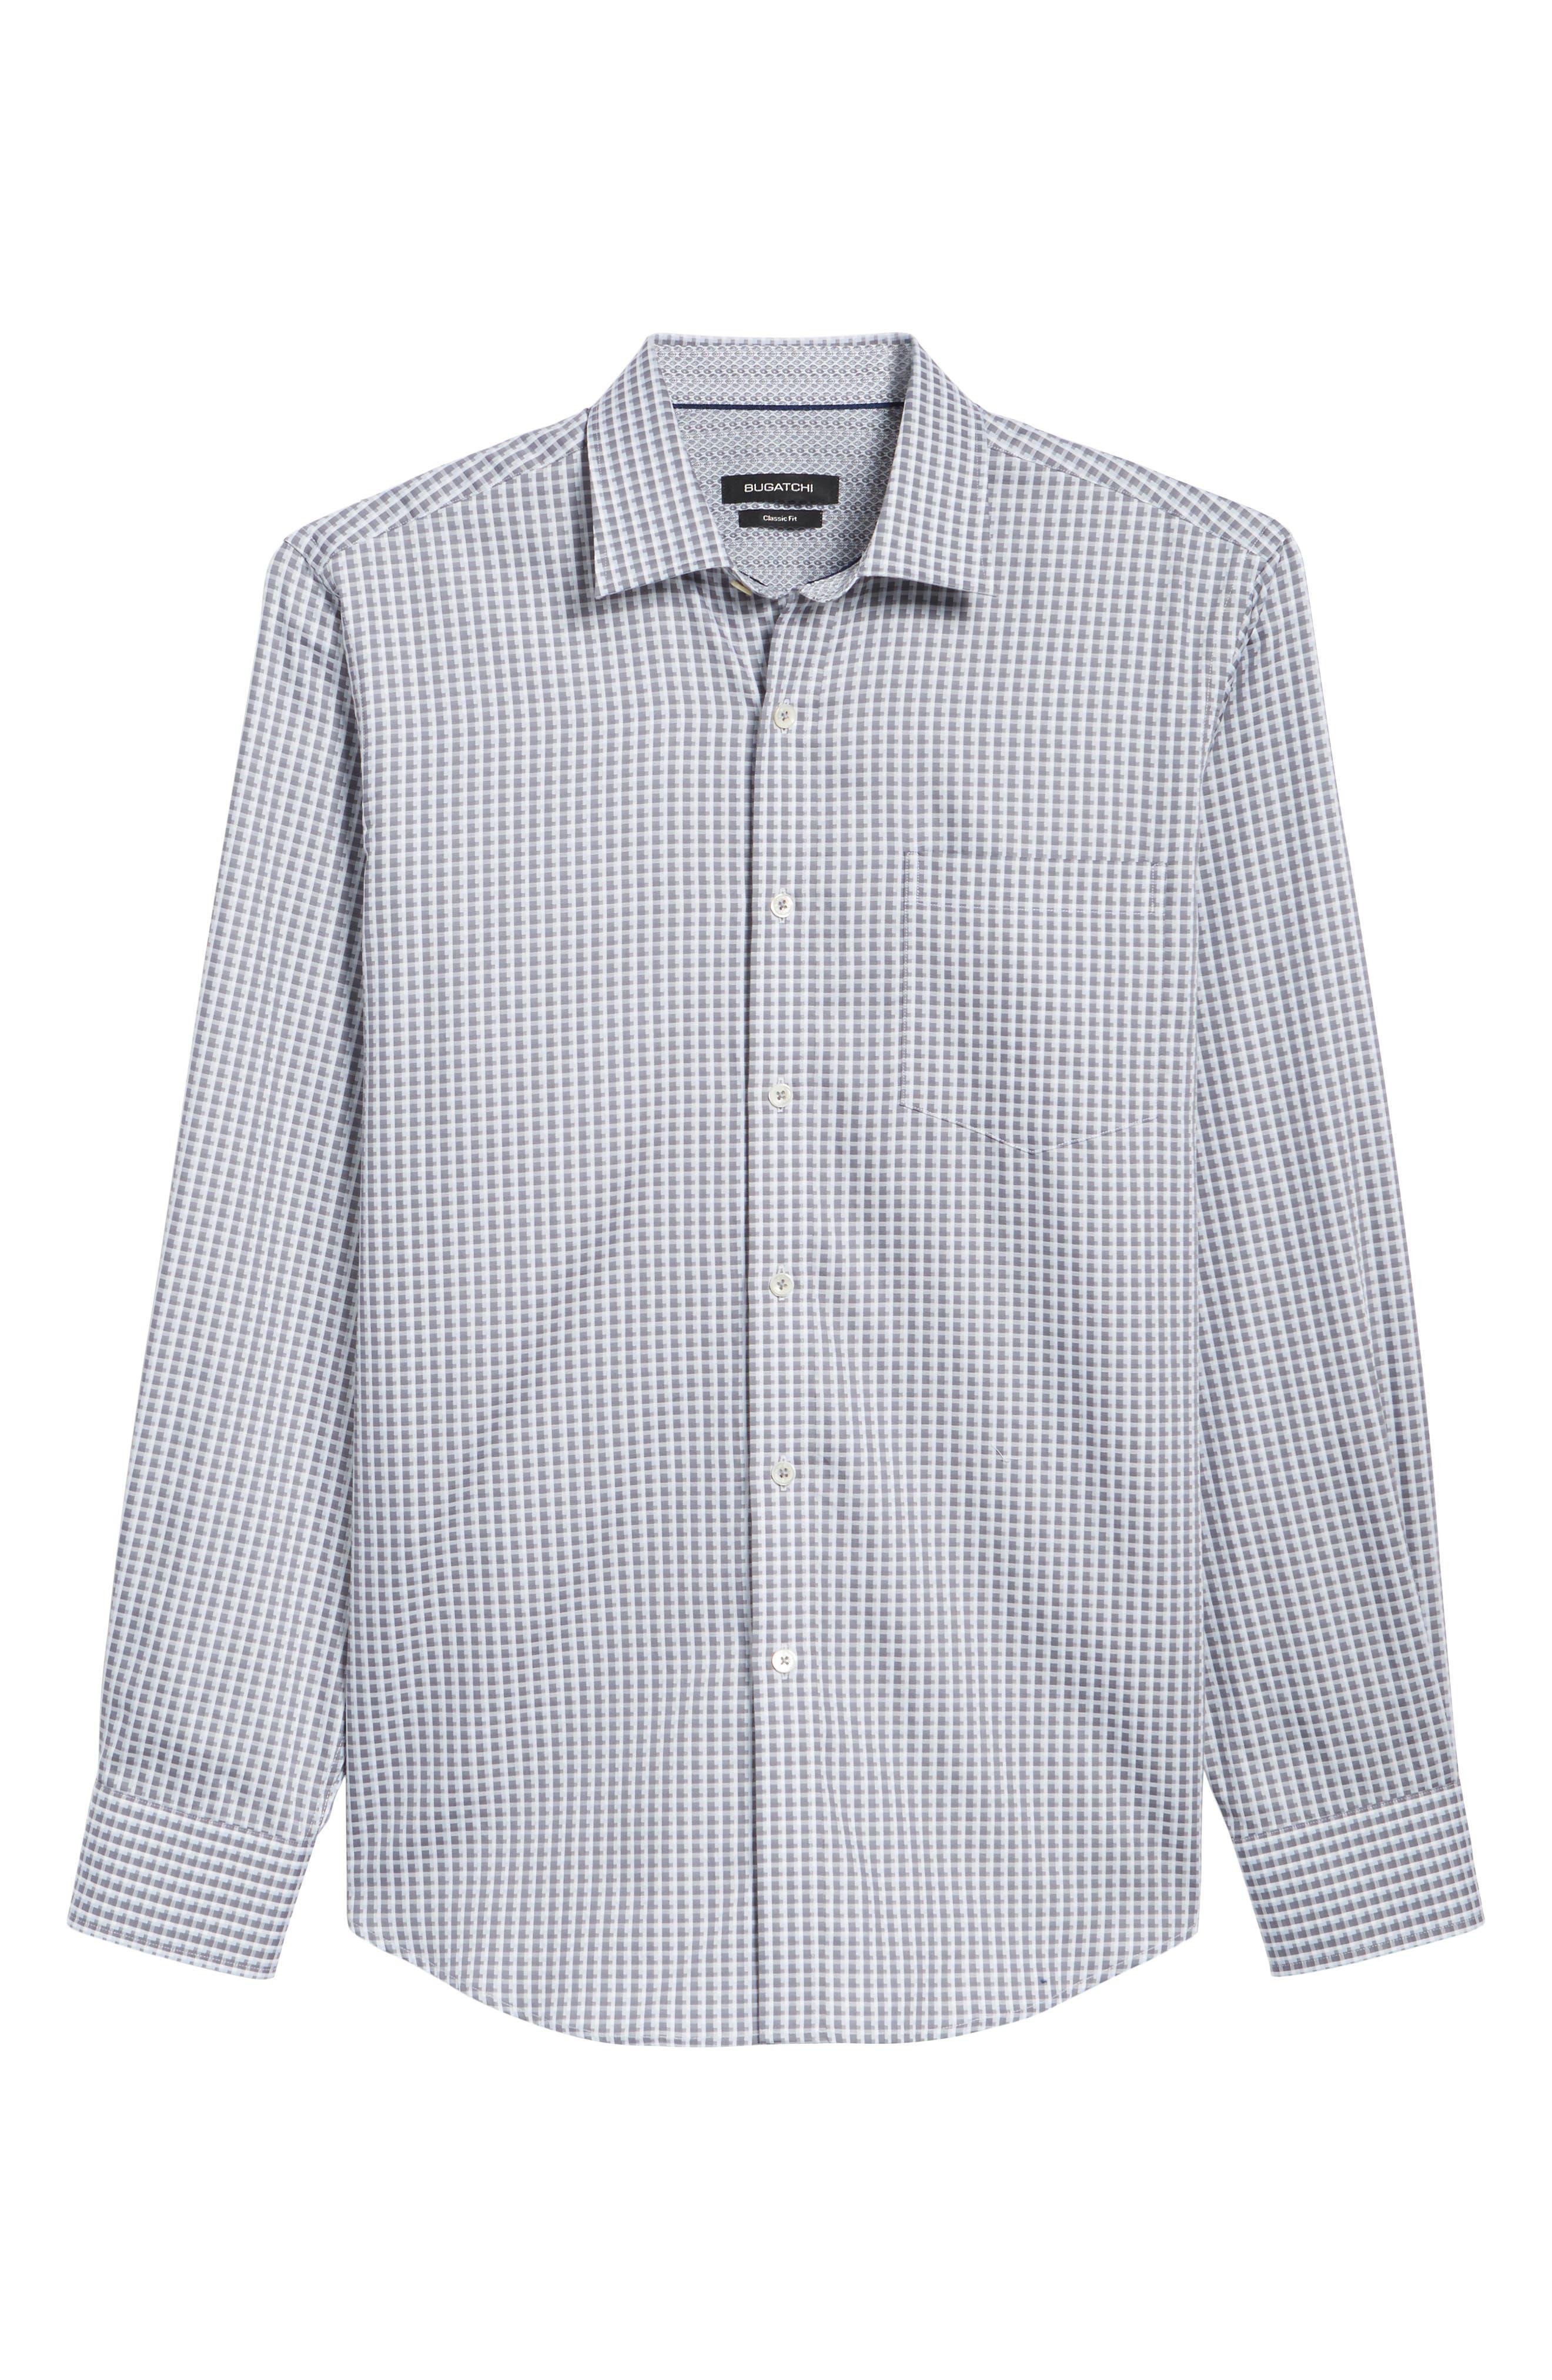 Regular Fit Check Sport Shirt,                             Alternate thumbnail 6, color,                             040